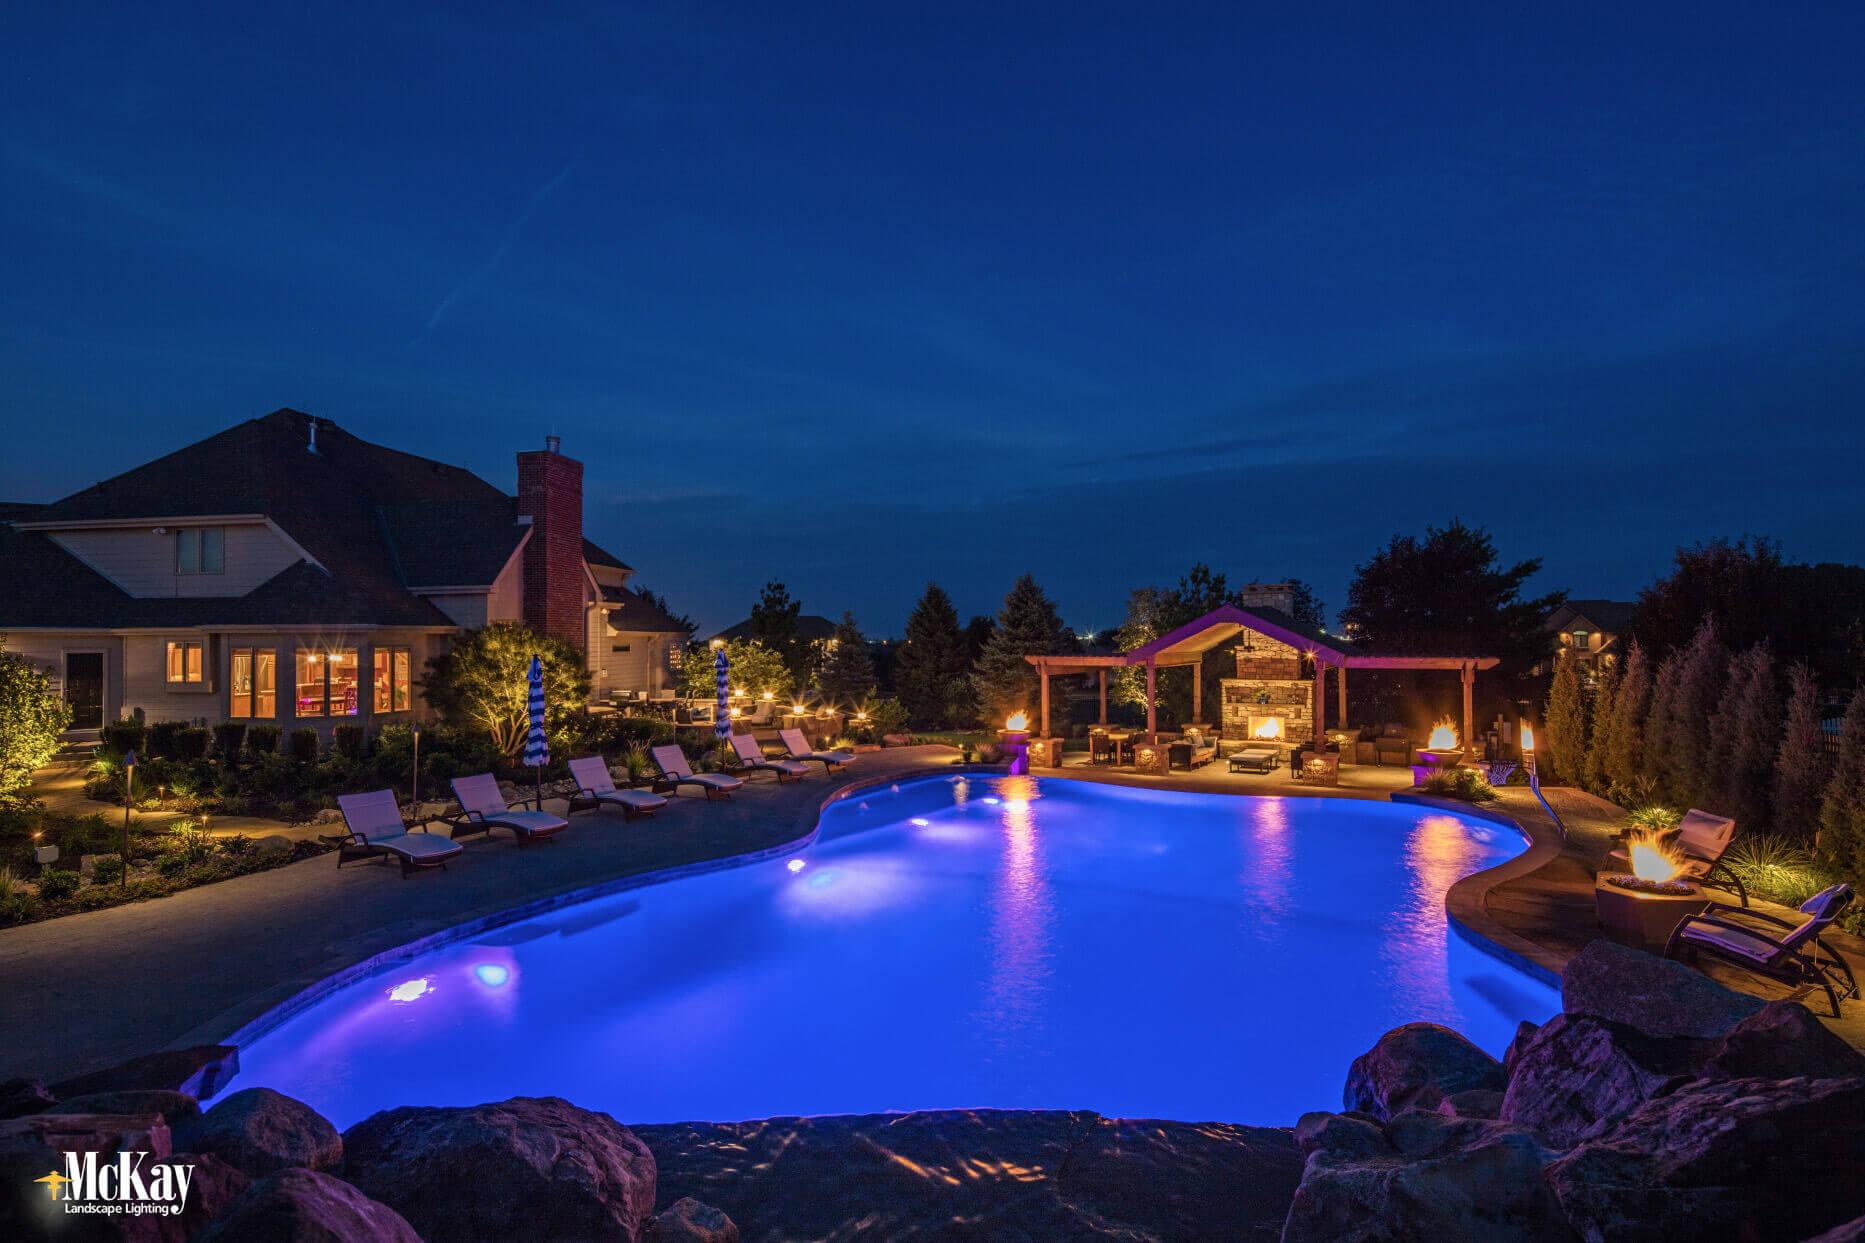 landscape lighting around a pool omaha nebraska - mckay landscape lighting